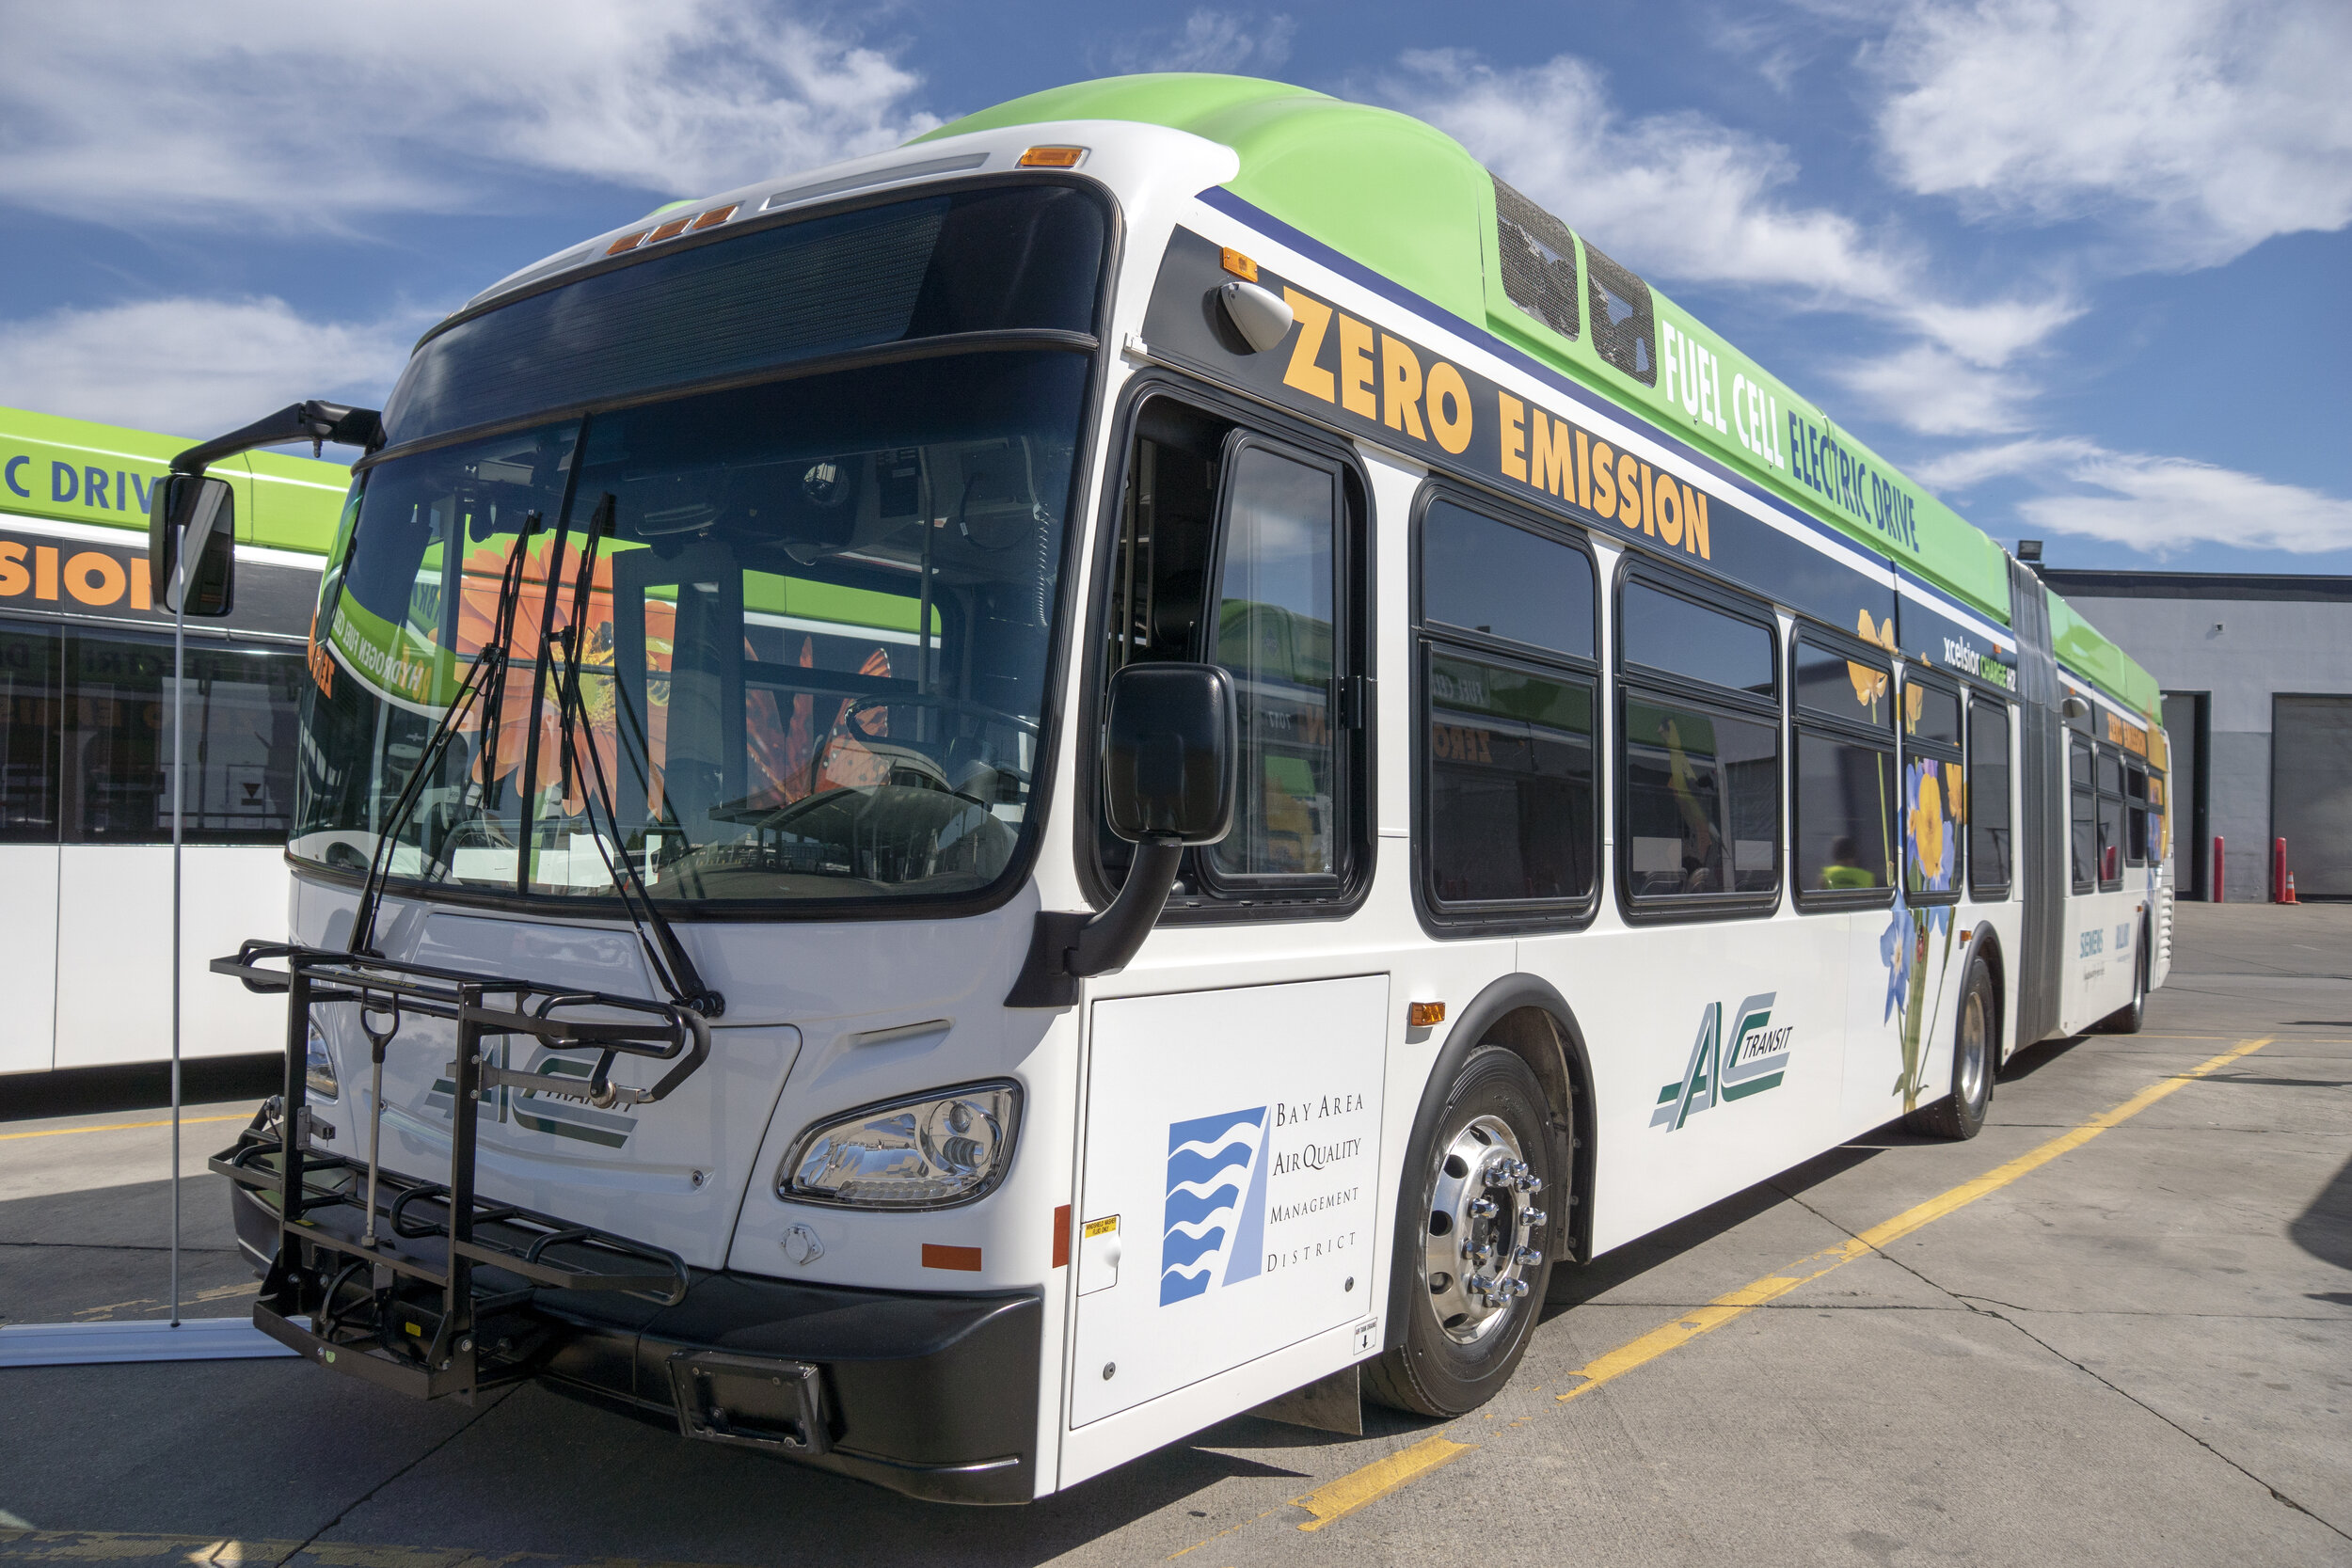 Zero Emission transit bus